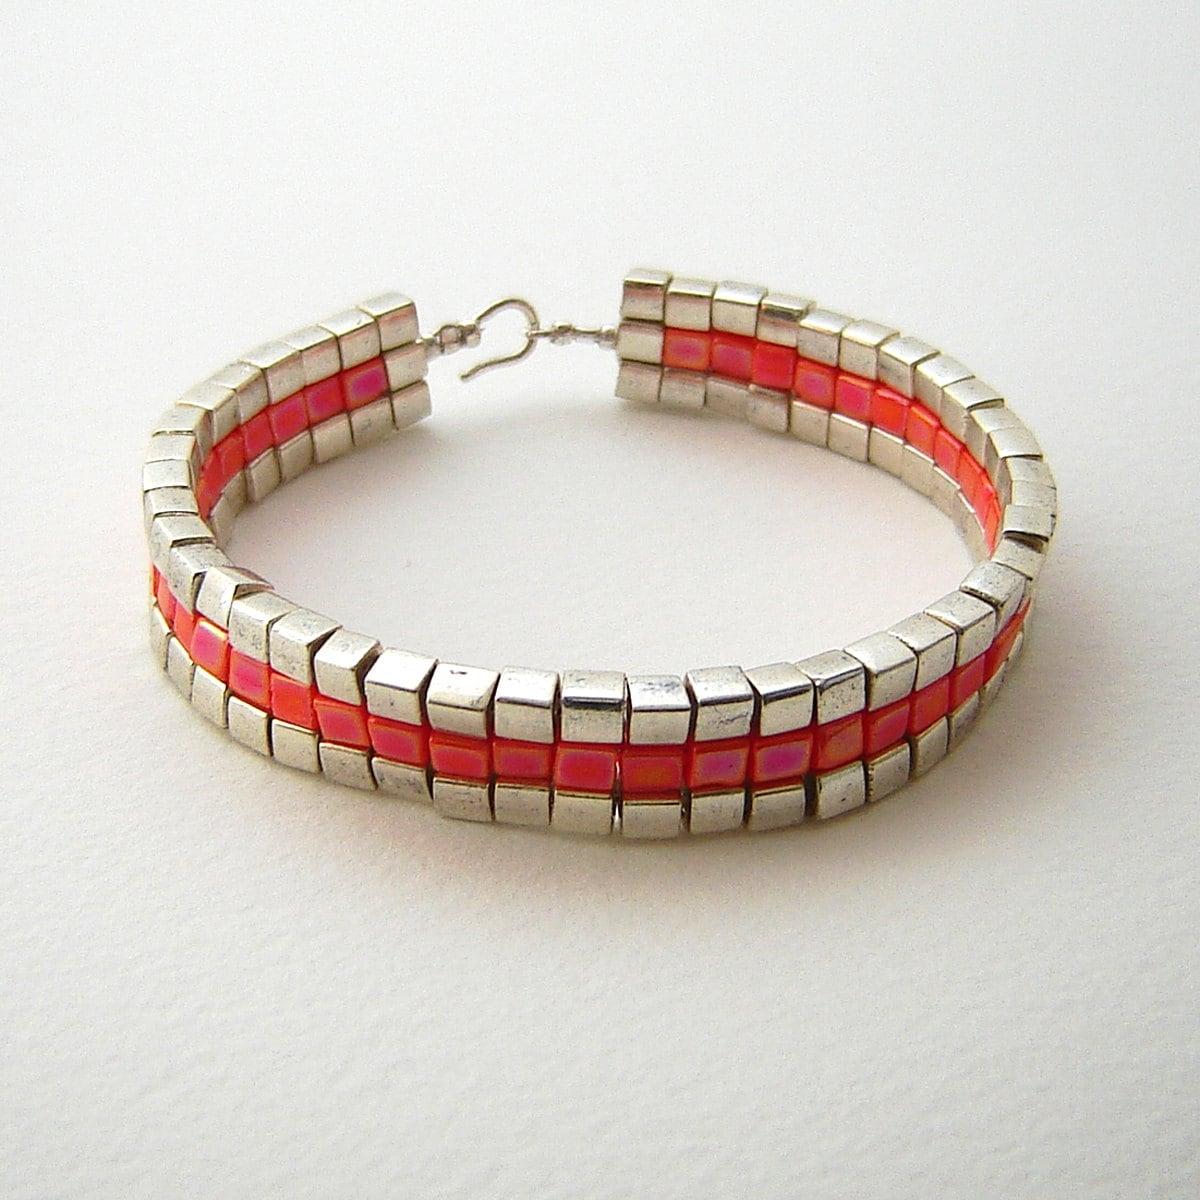 Silver Band Bracelet: Silver And Orange Band Bracelet Art Deco Flat Square Pattern